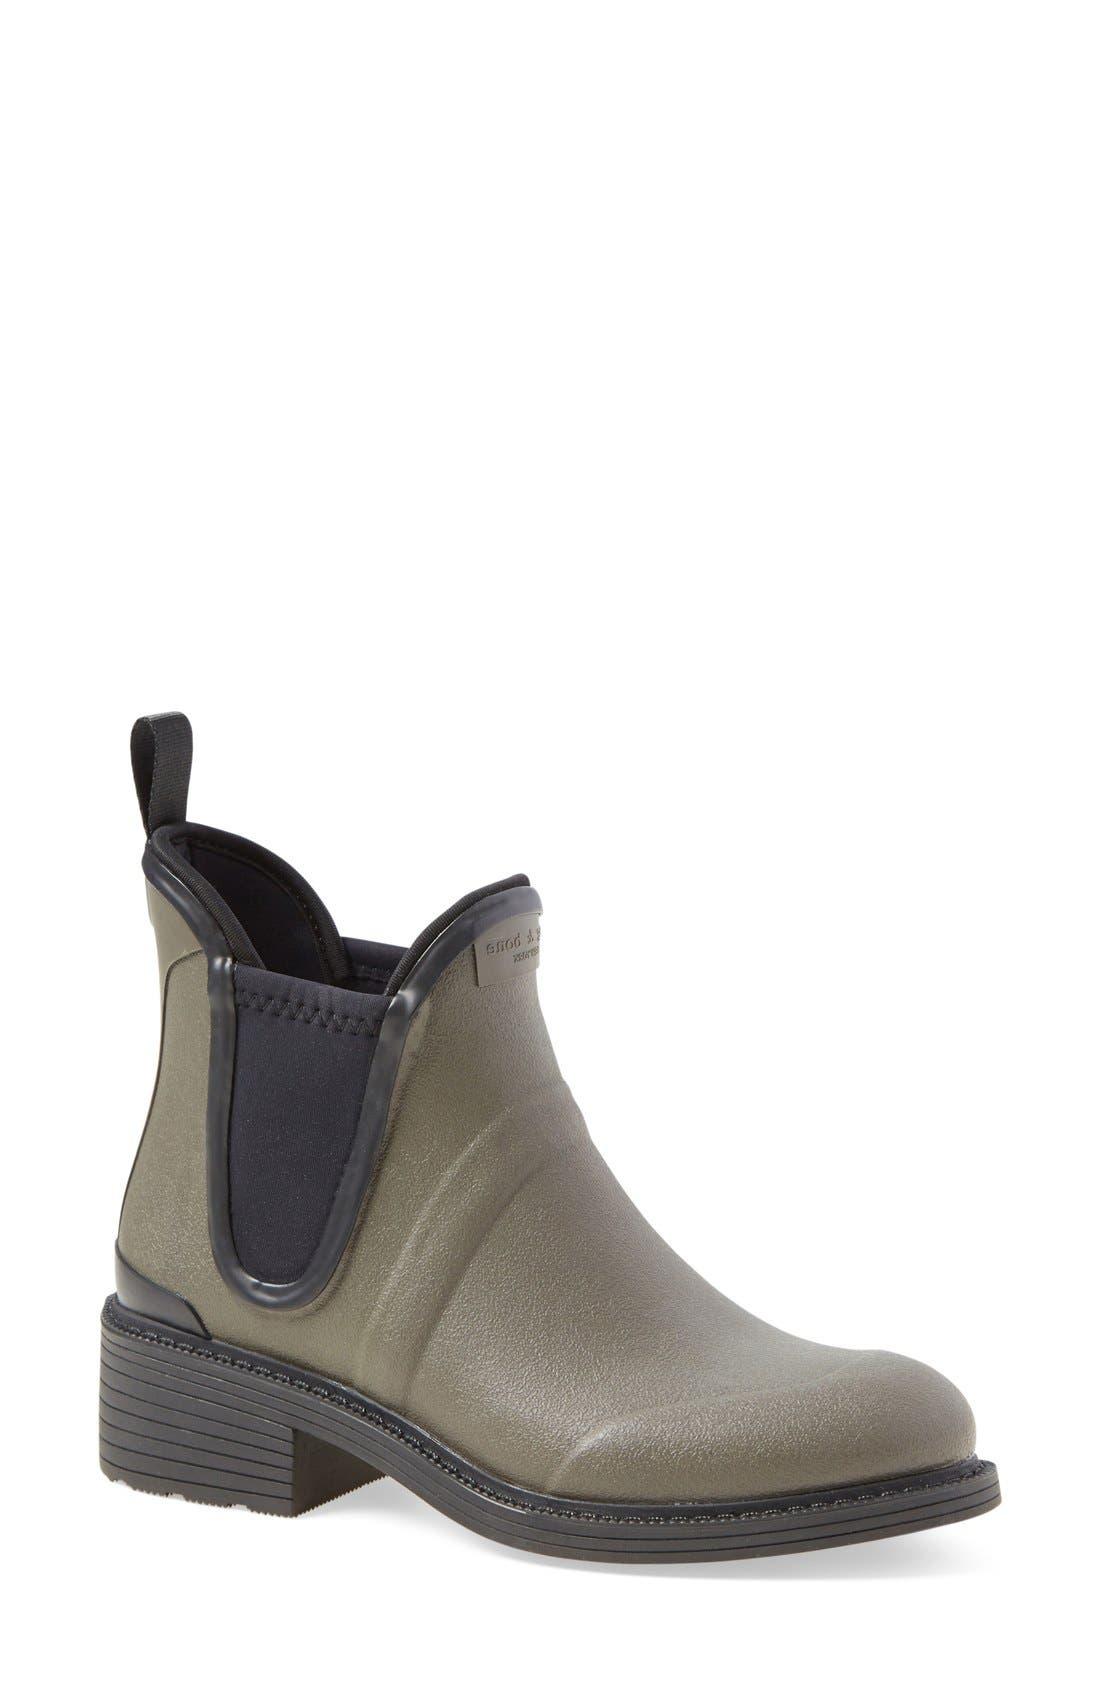 Alternate Image 1 Selected - rag & bone 'Dartford' Rubber Boot (Women)